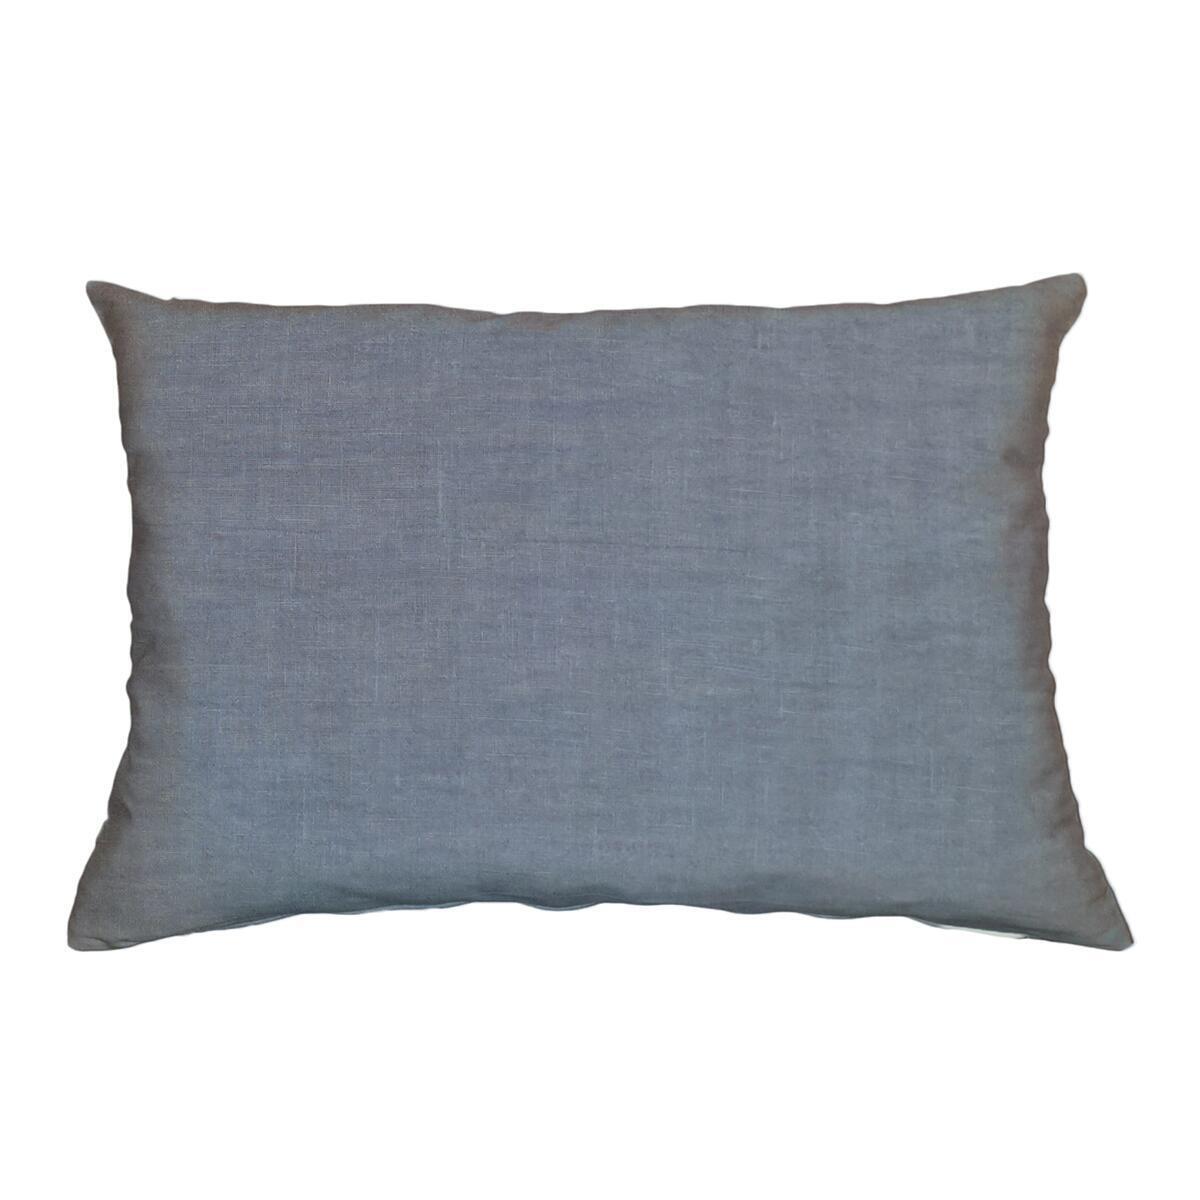 Cuscino Lino viola 40x60 cm - 1